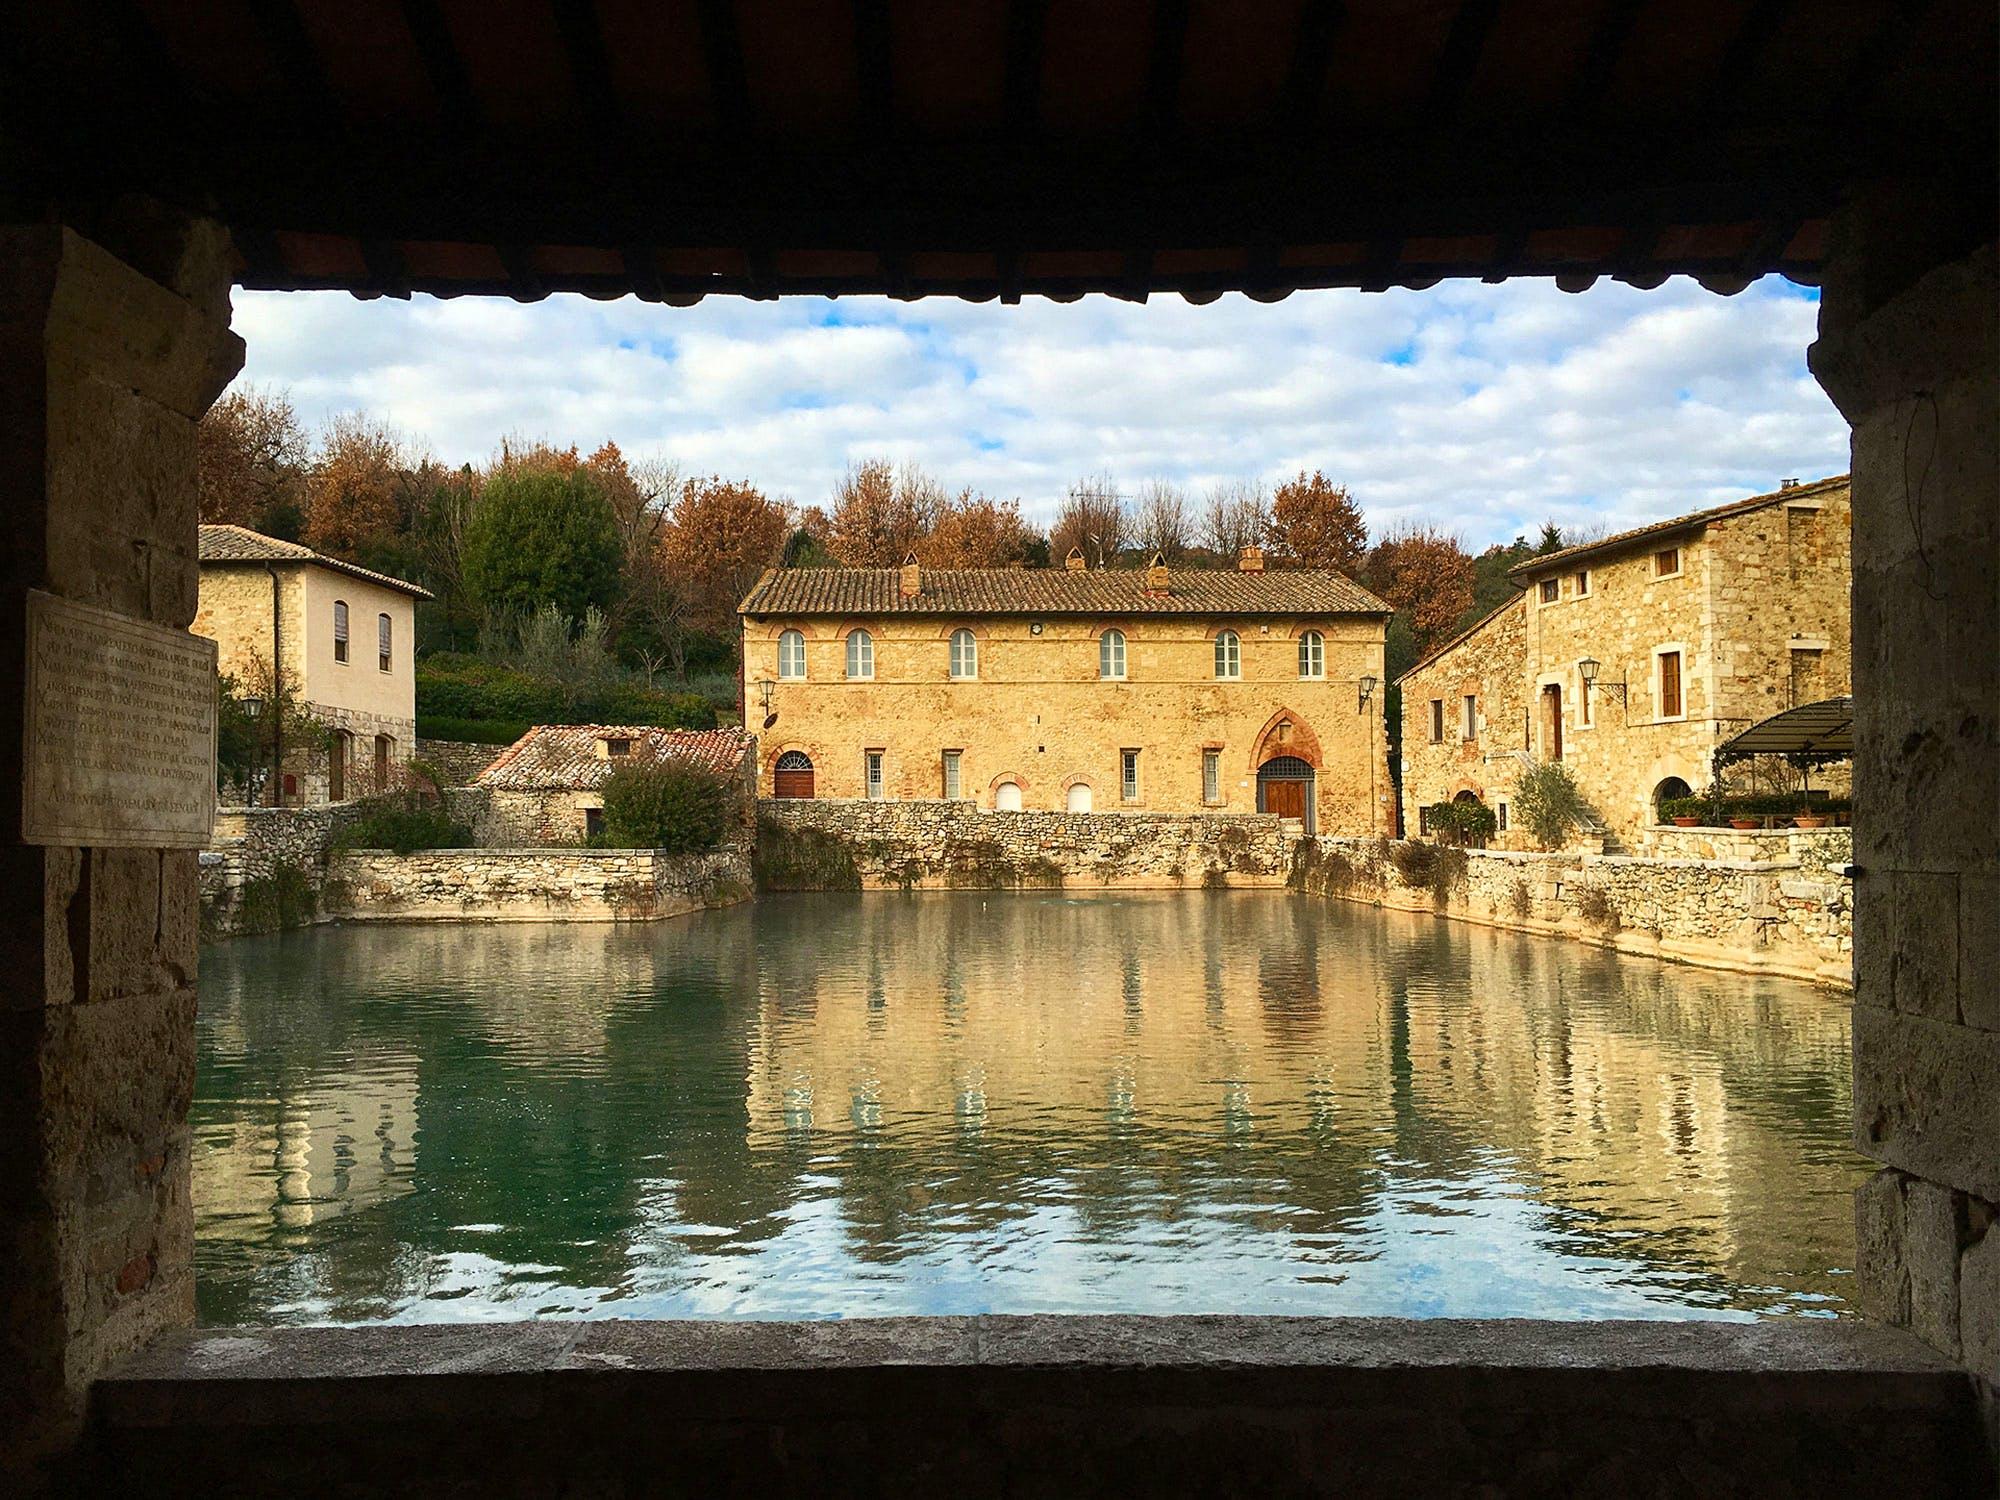 Val dorcia tuscany: visiting val dorcia in tuscany